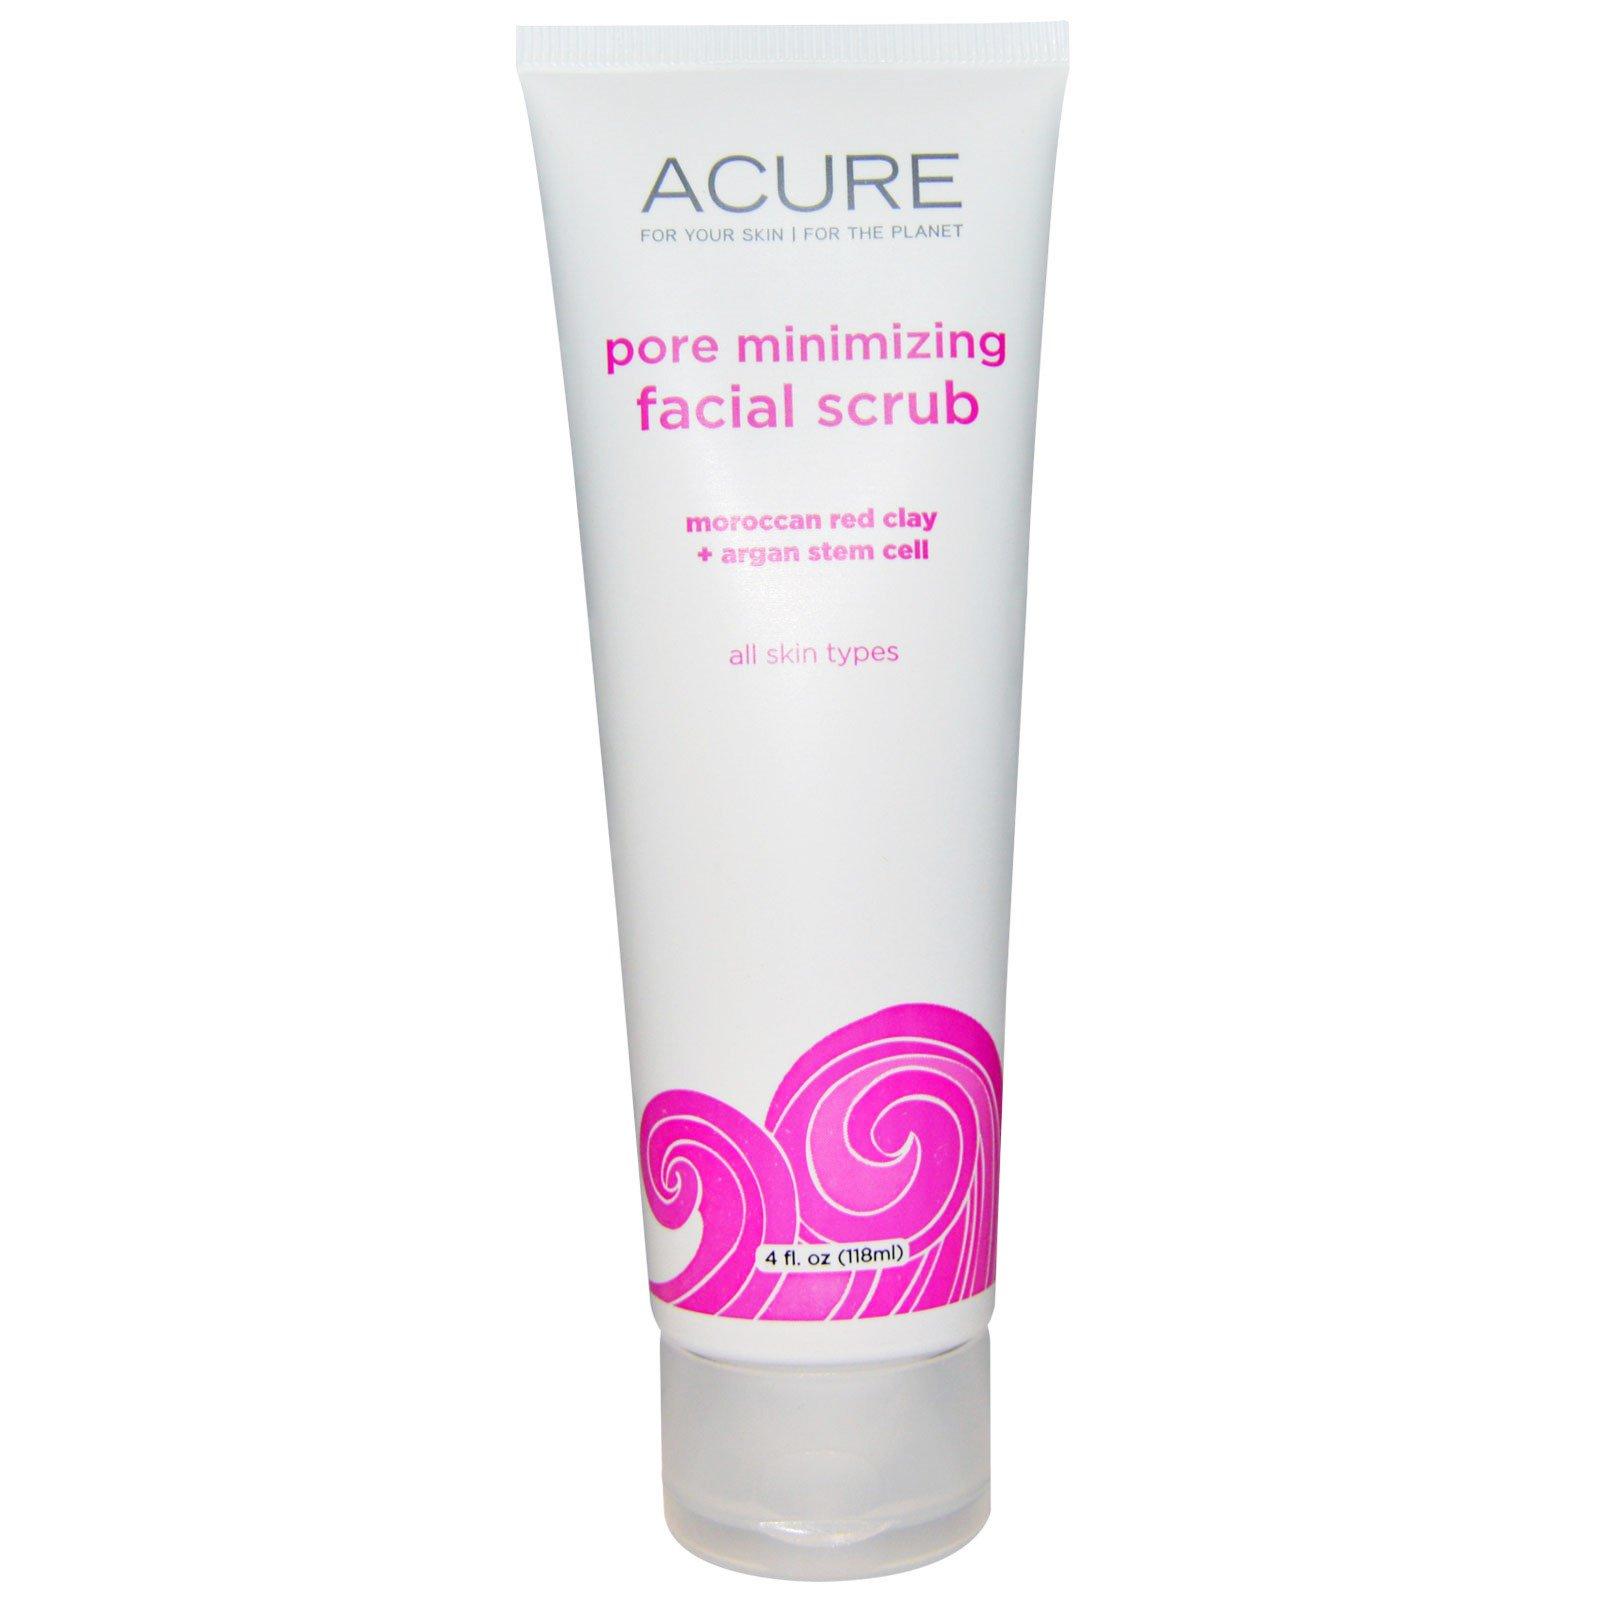 Acure, Pore Minimizing Facial Scrub, 4 Fl Oz (118 Ml)